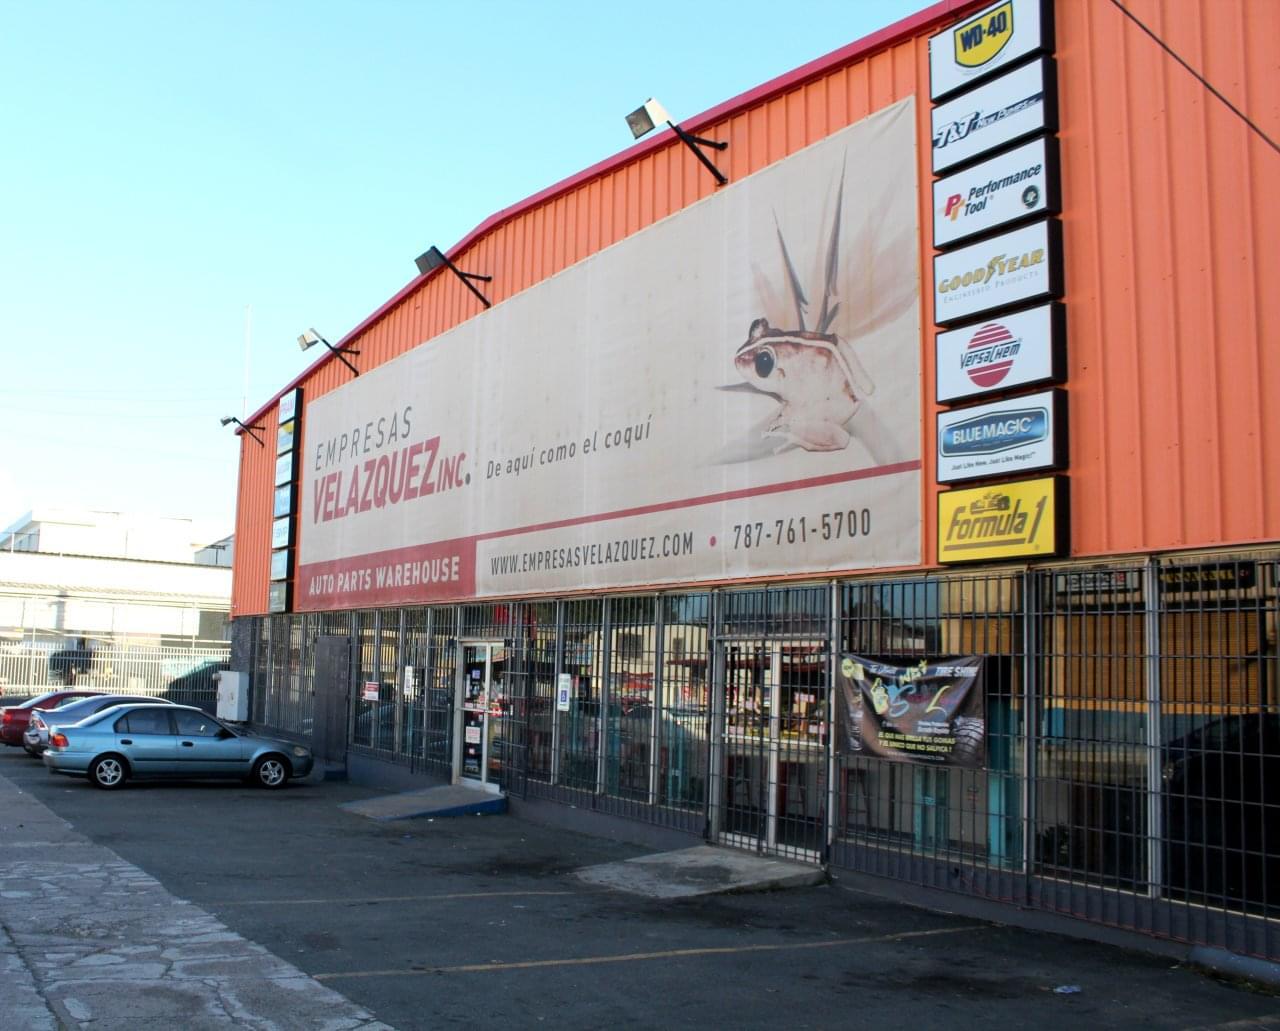 Empresas Velazquez Inc. – See-Inside Wholesaler – San Juan, PR